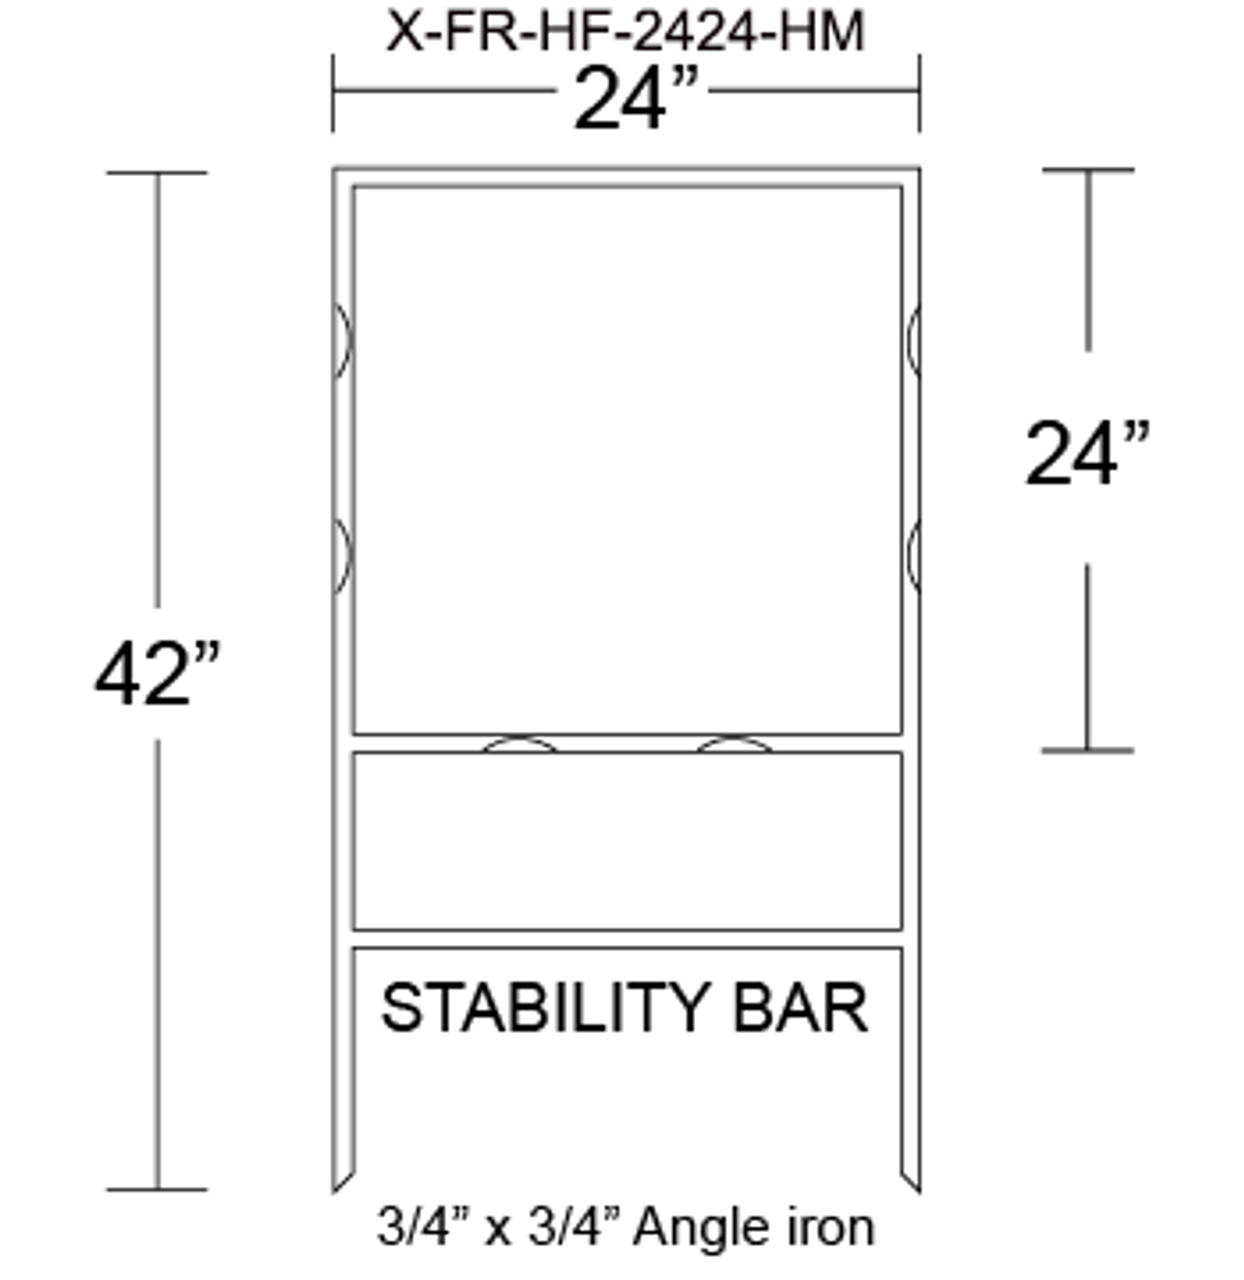 X-FR-HF-2424-HM